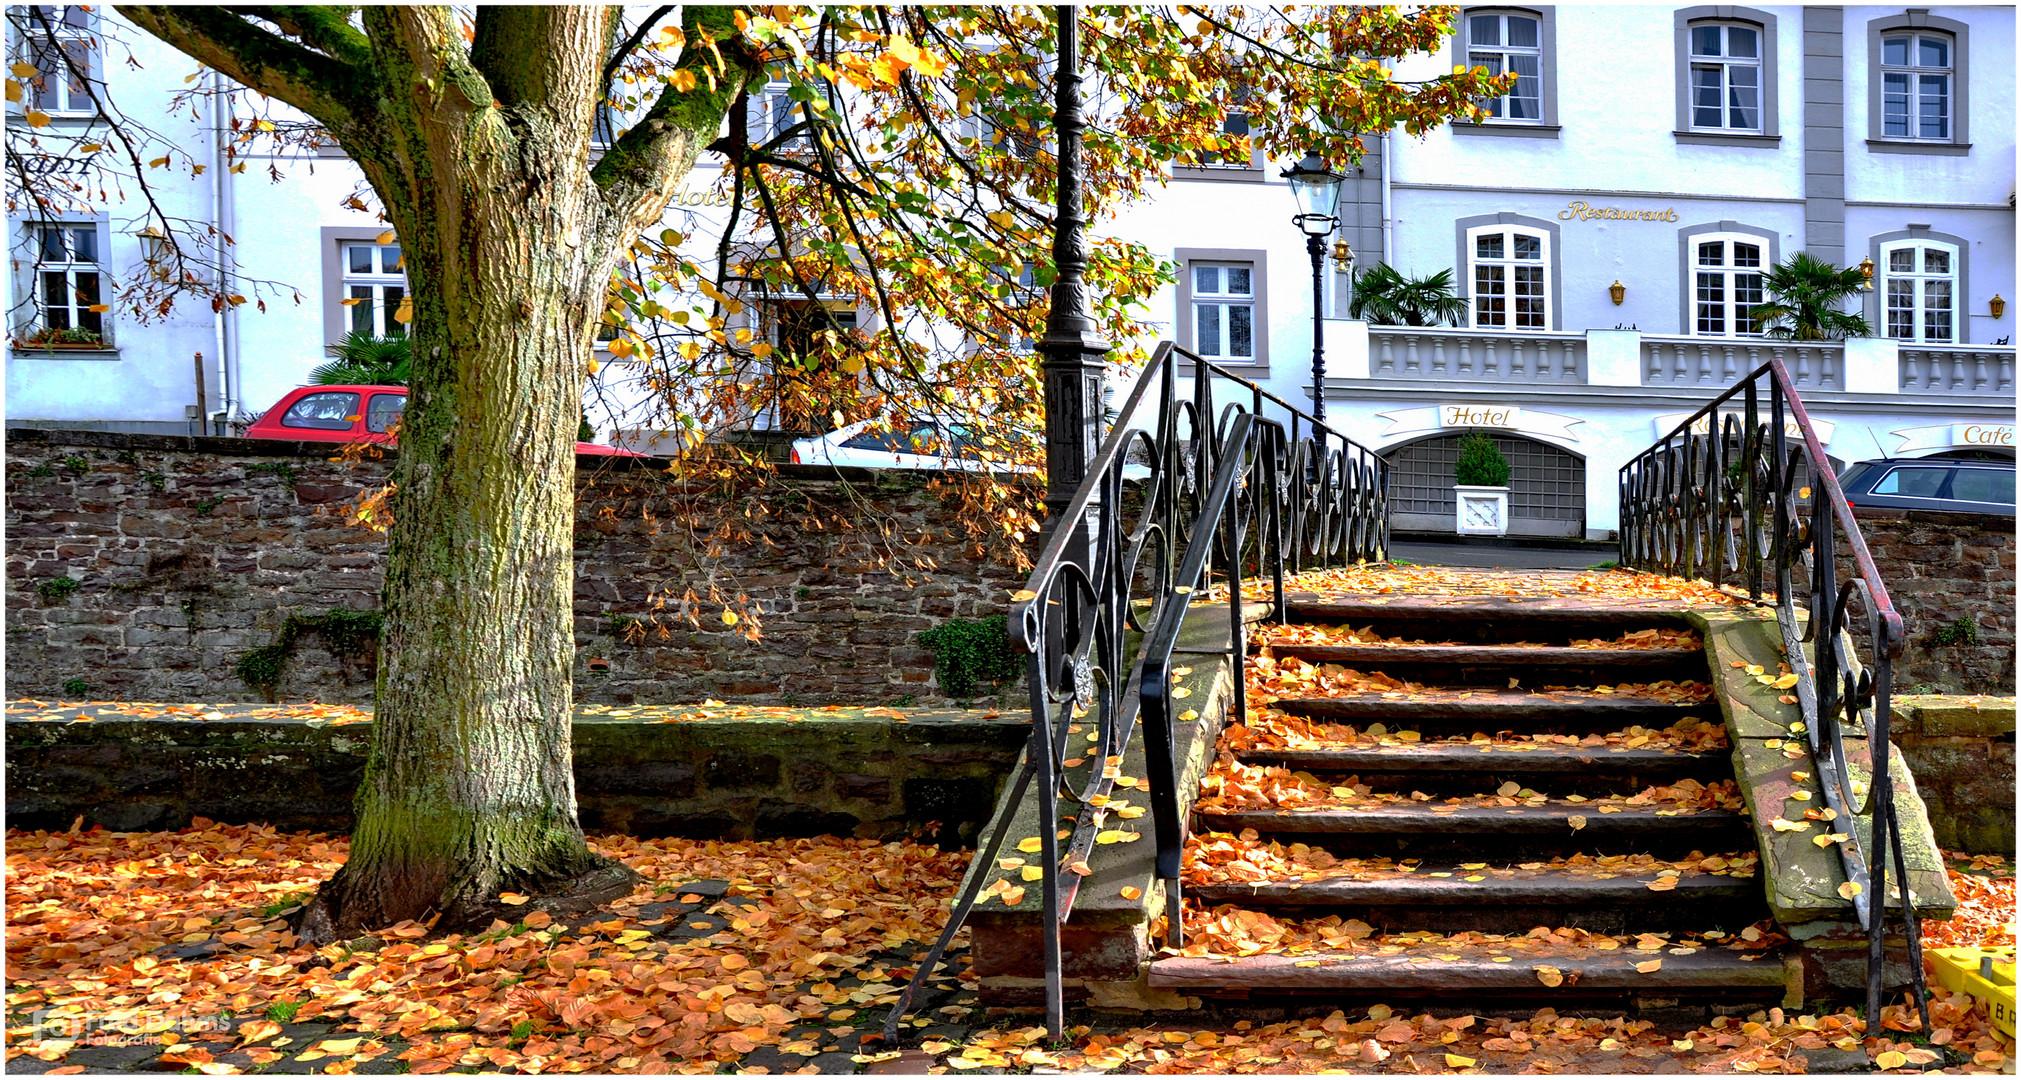 Spaziergang in Bad Karlshafen II